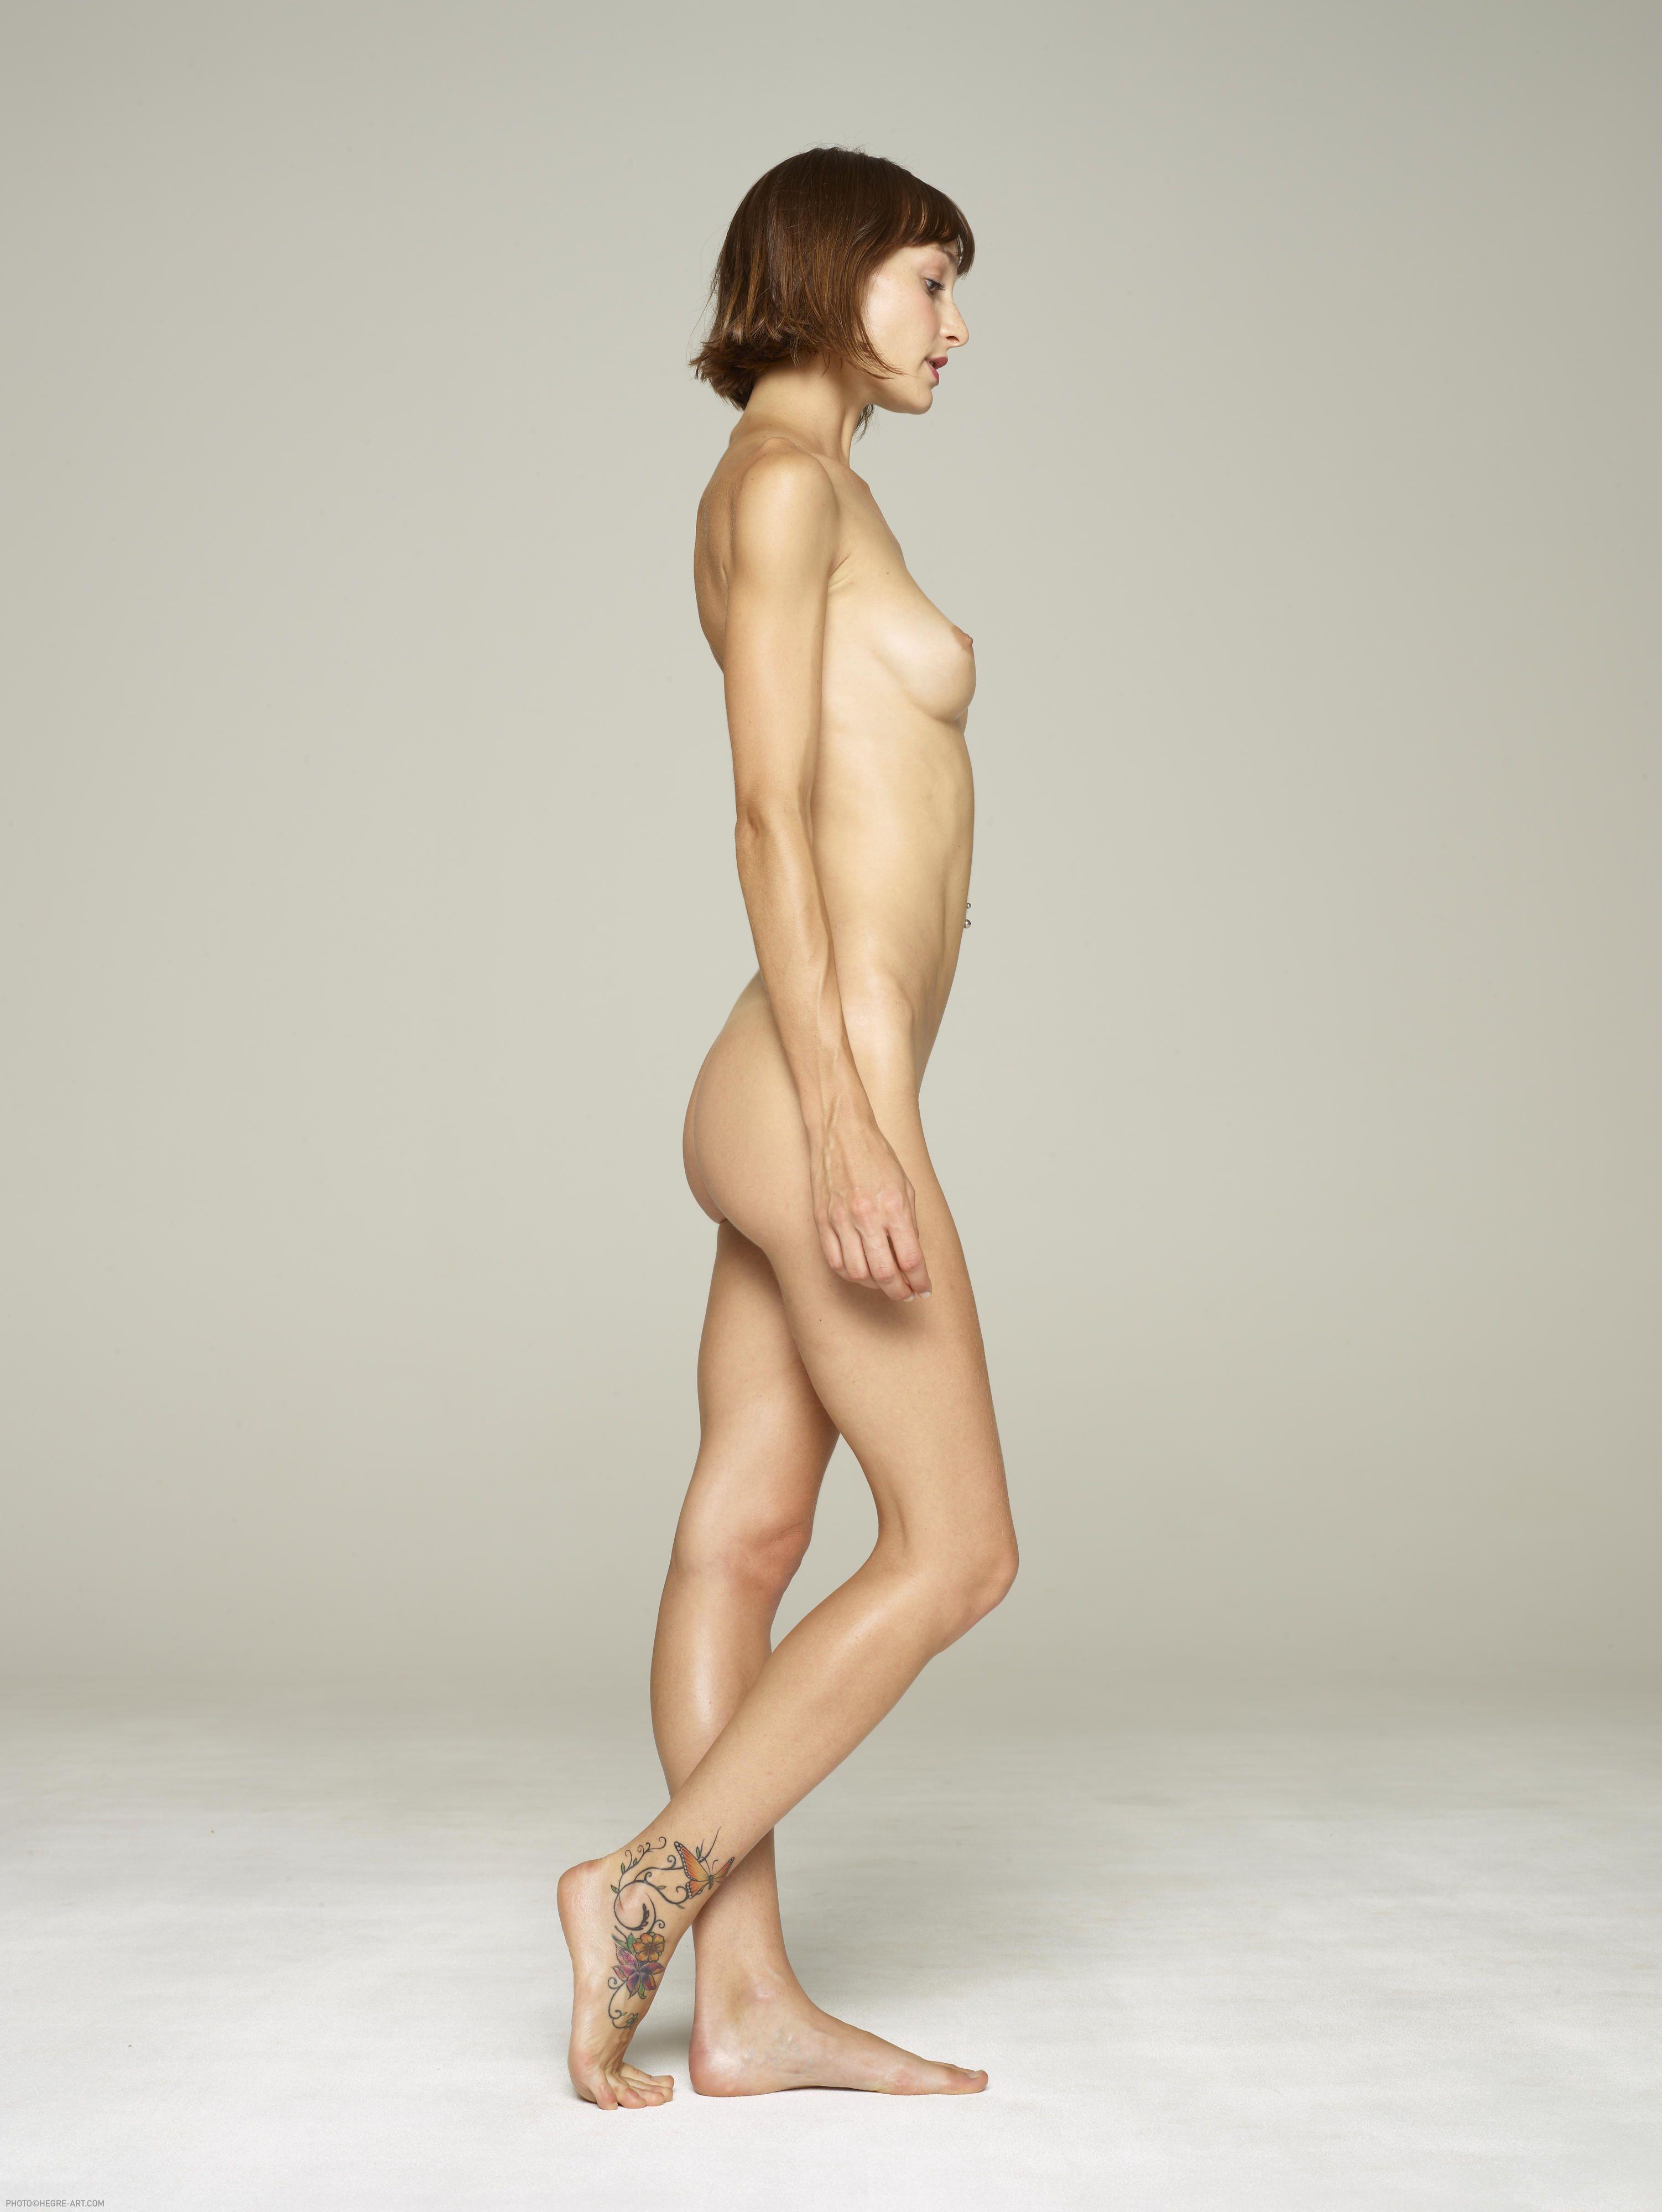 Muybridge art refrence